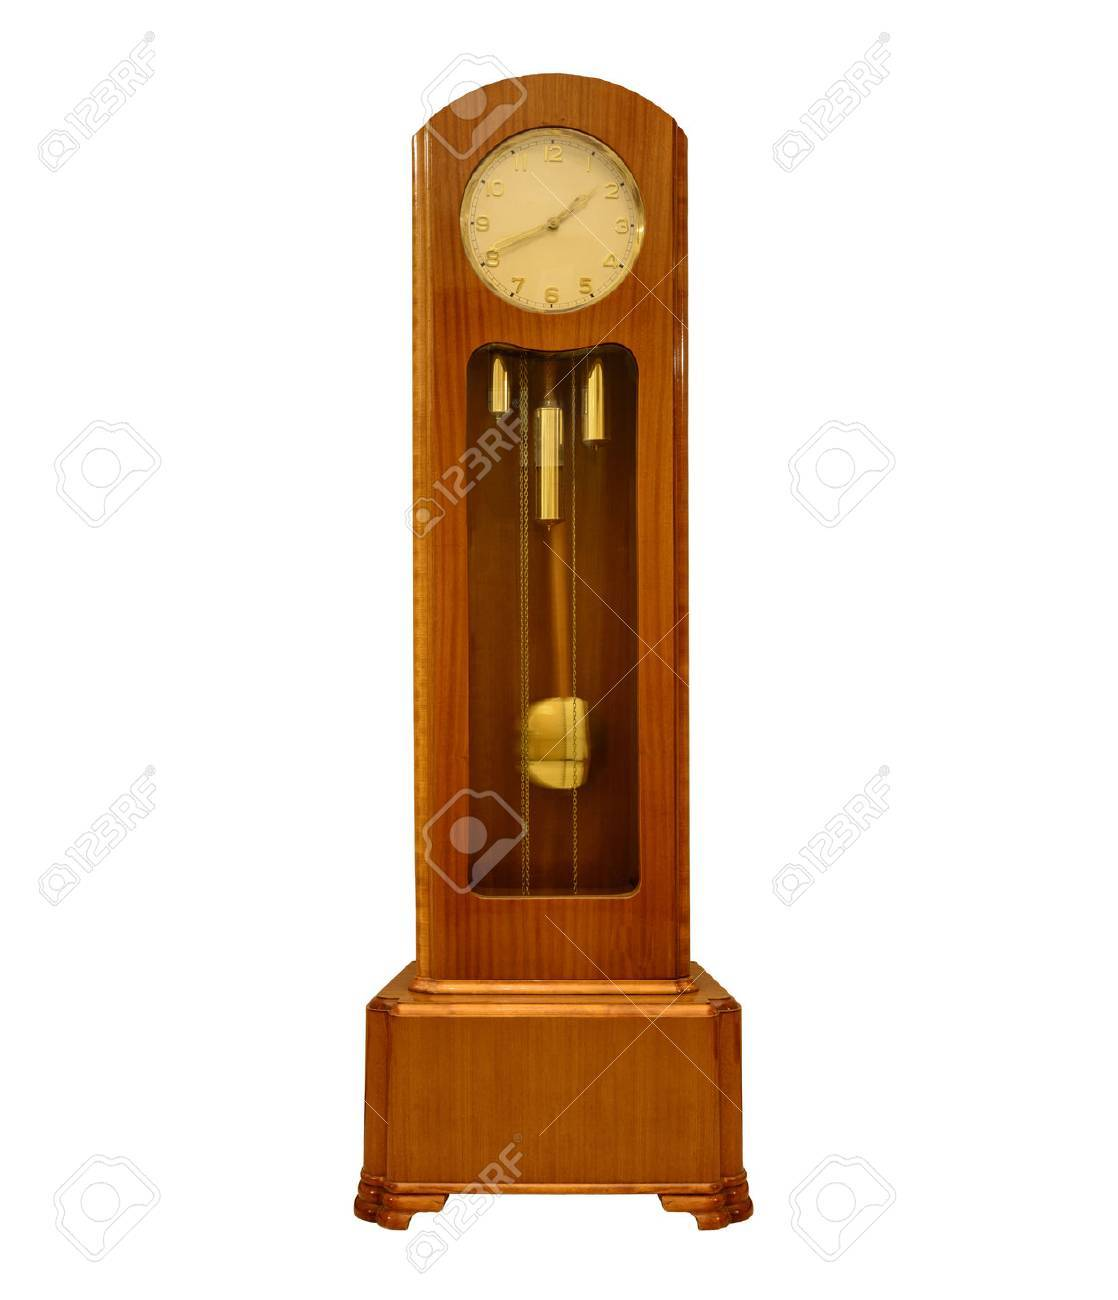 Vintage grandfather clock on white. - 70229064